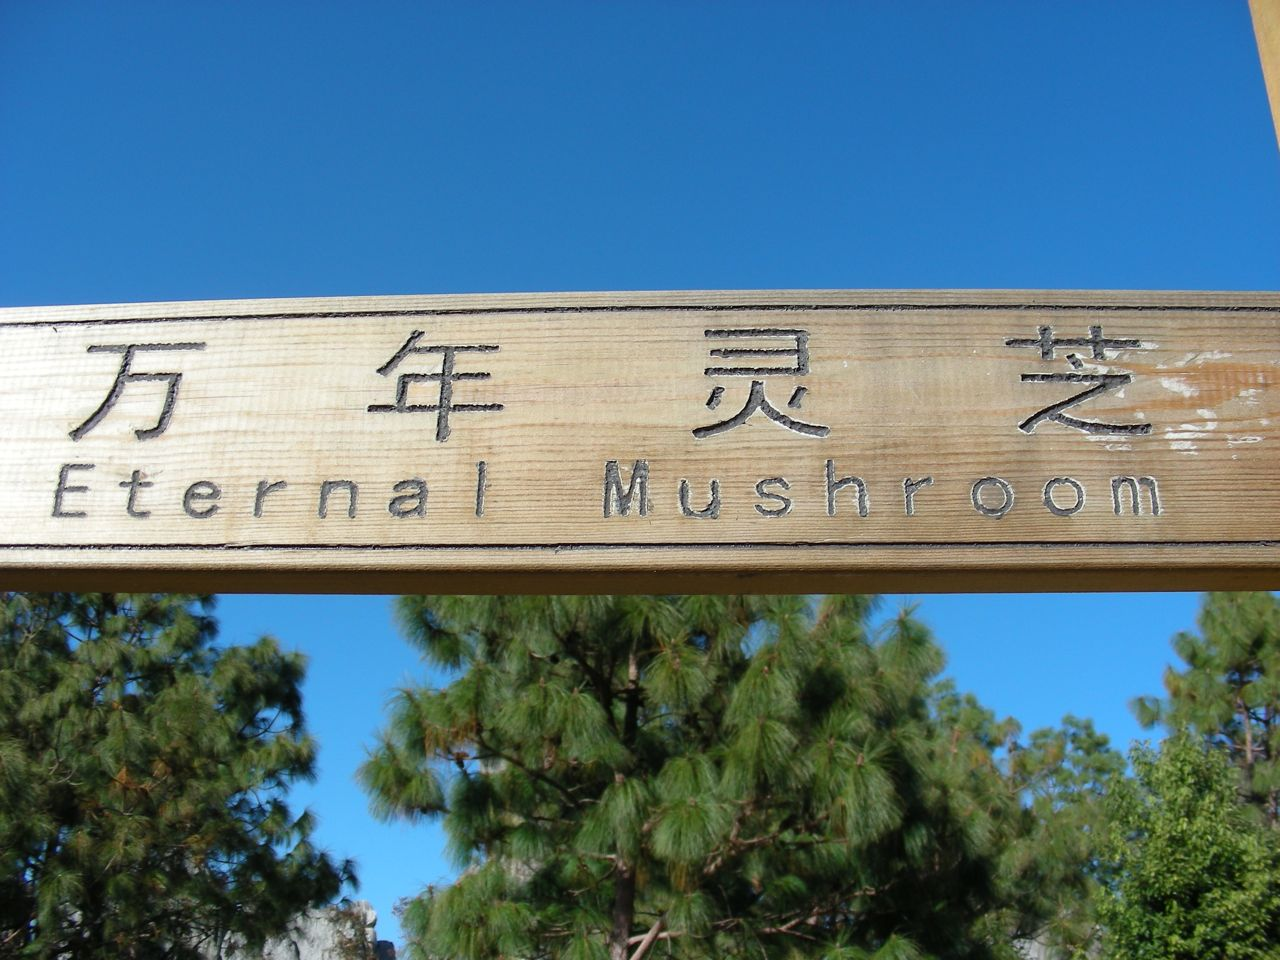 Eternal mushroom